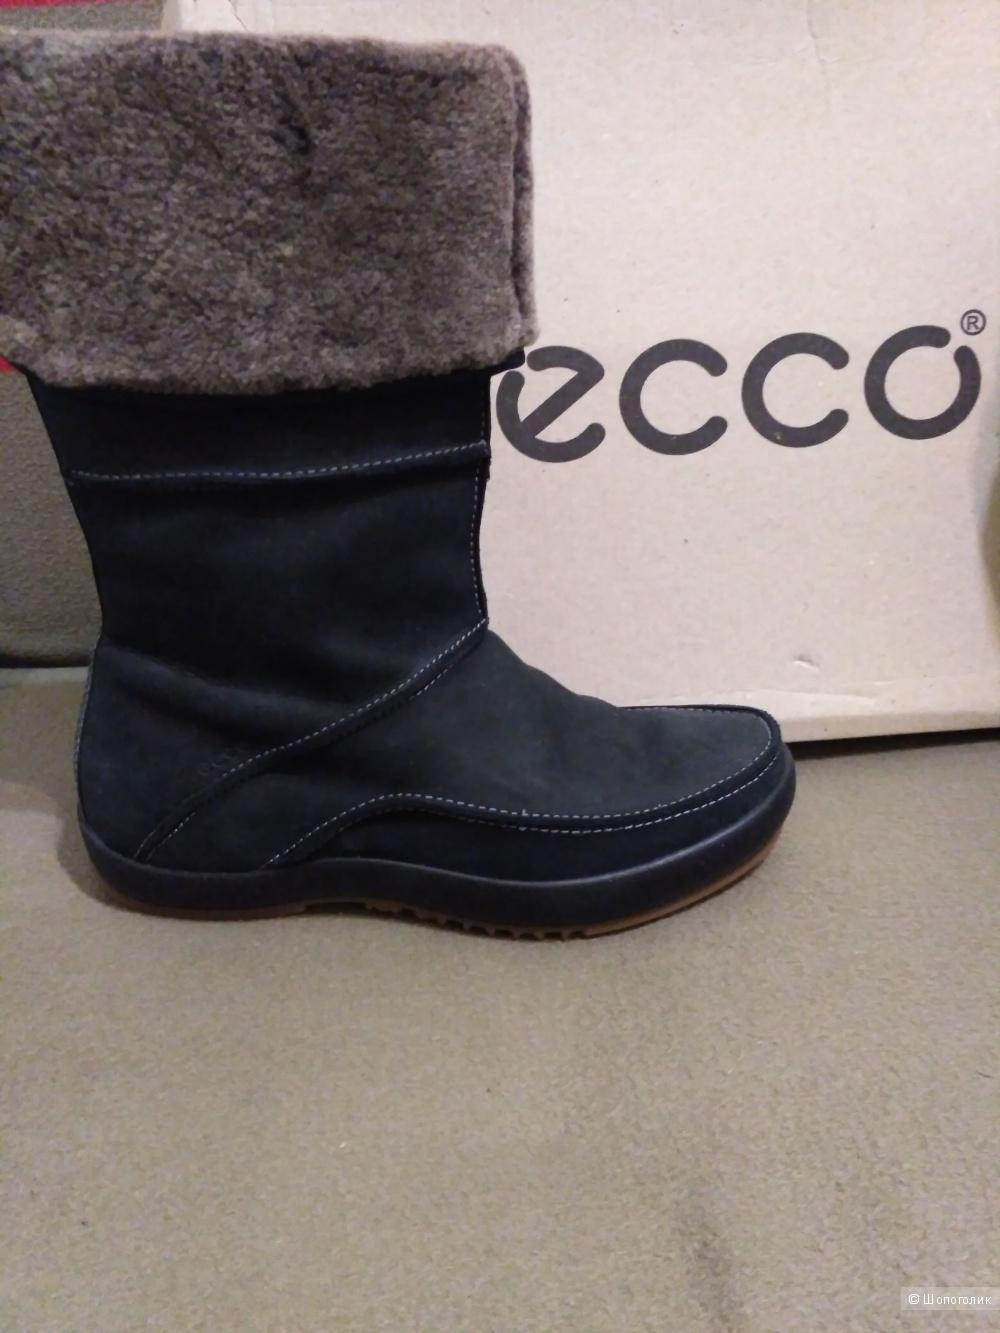 Сапоги ECCO, 38-39 размер